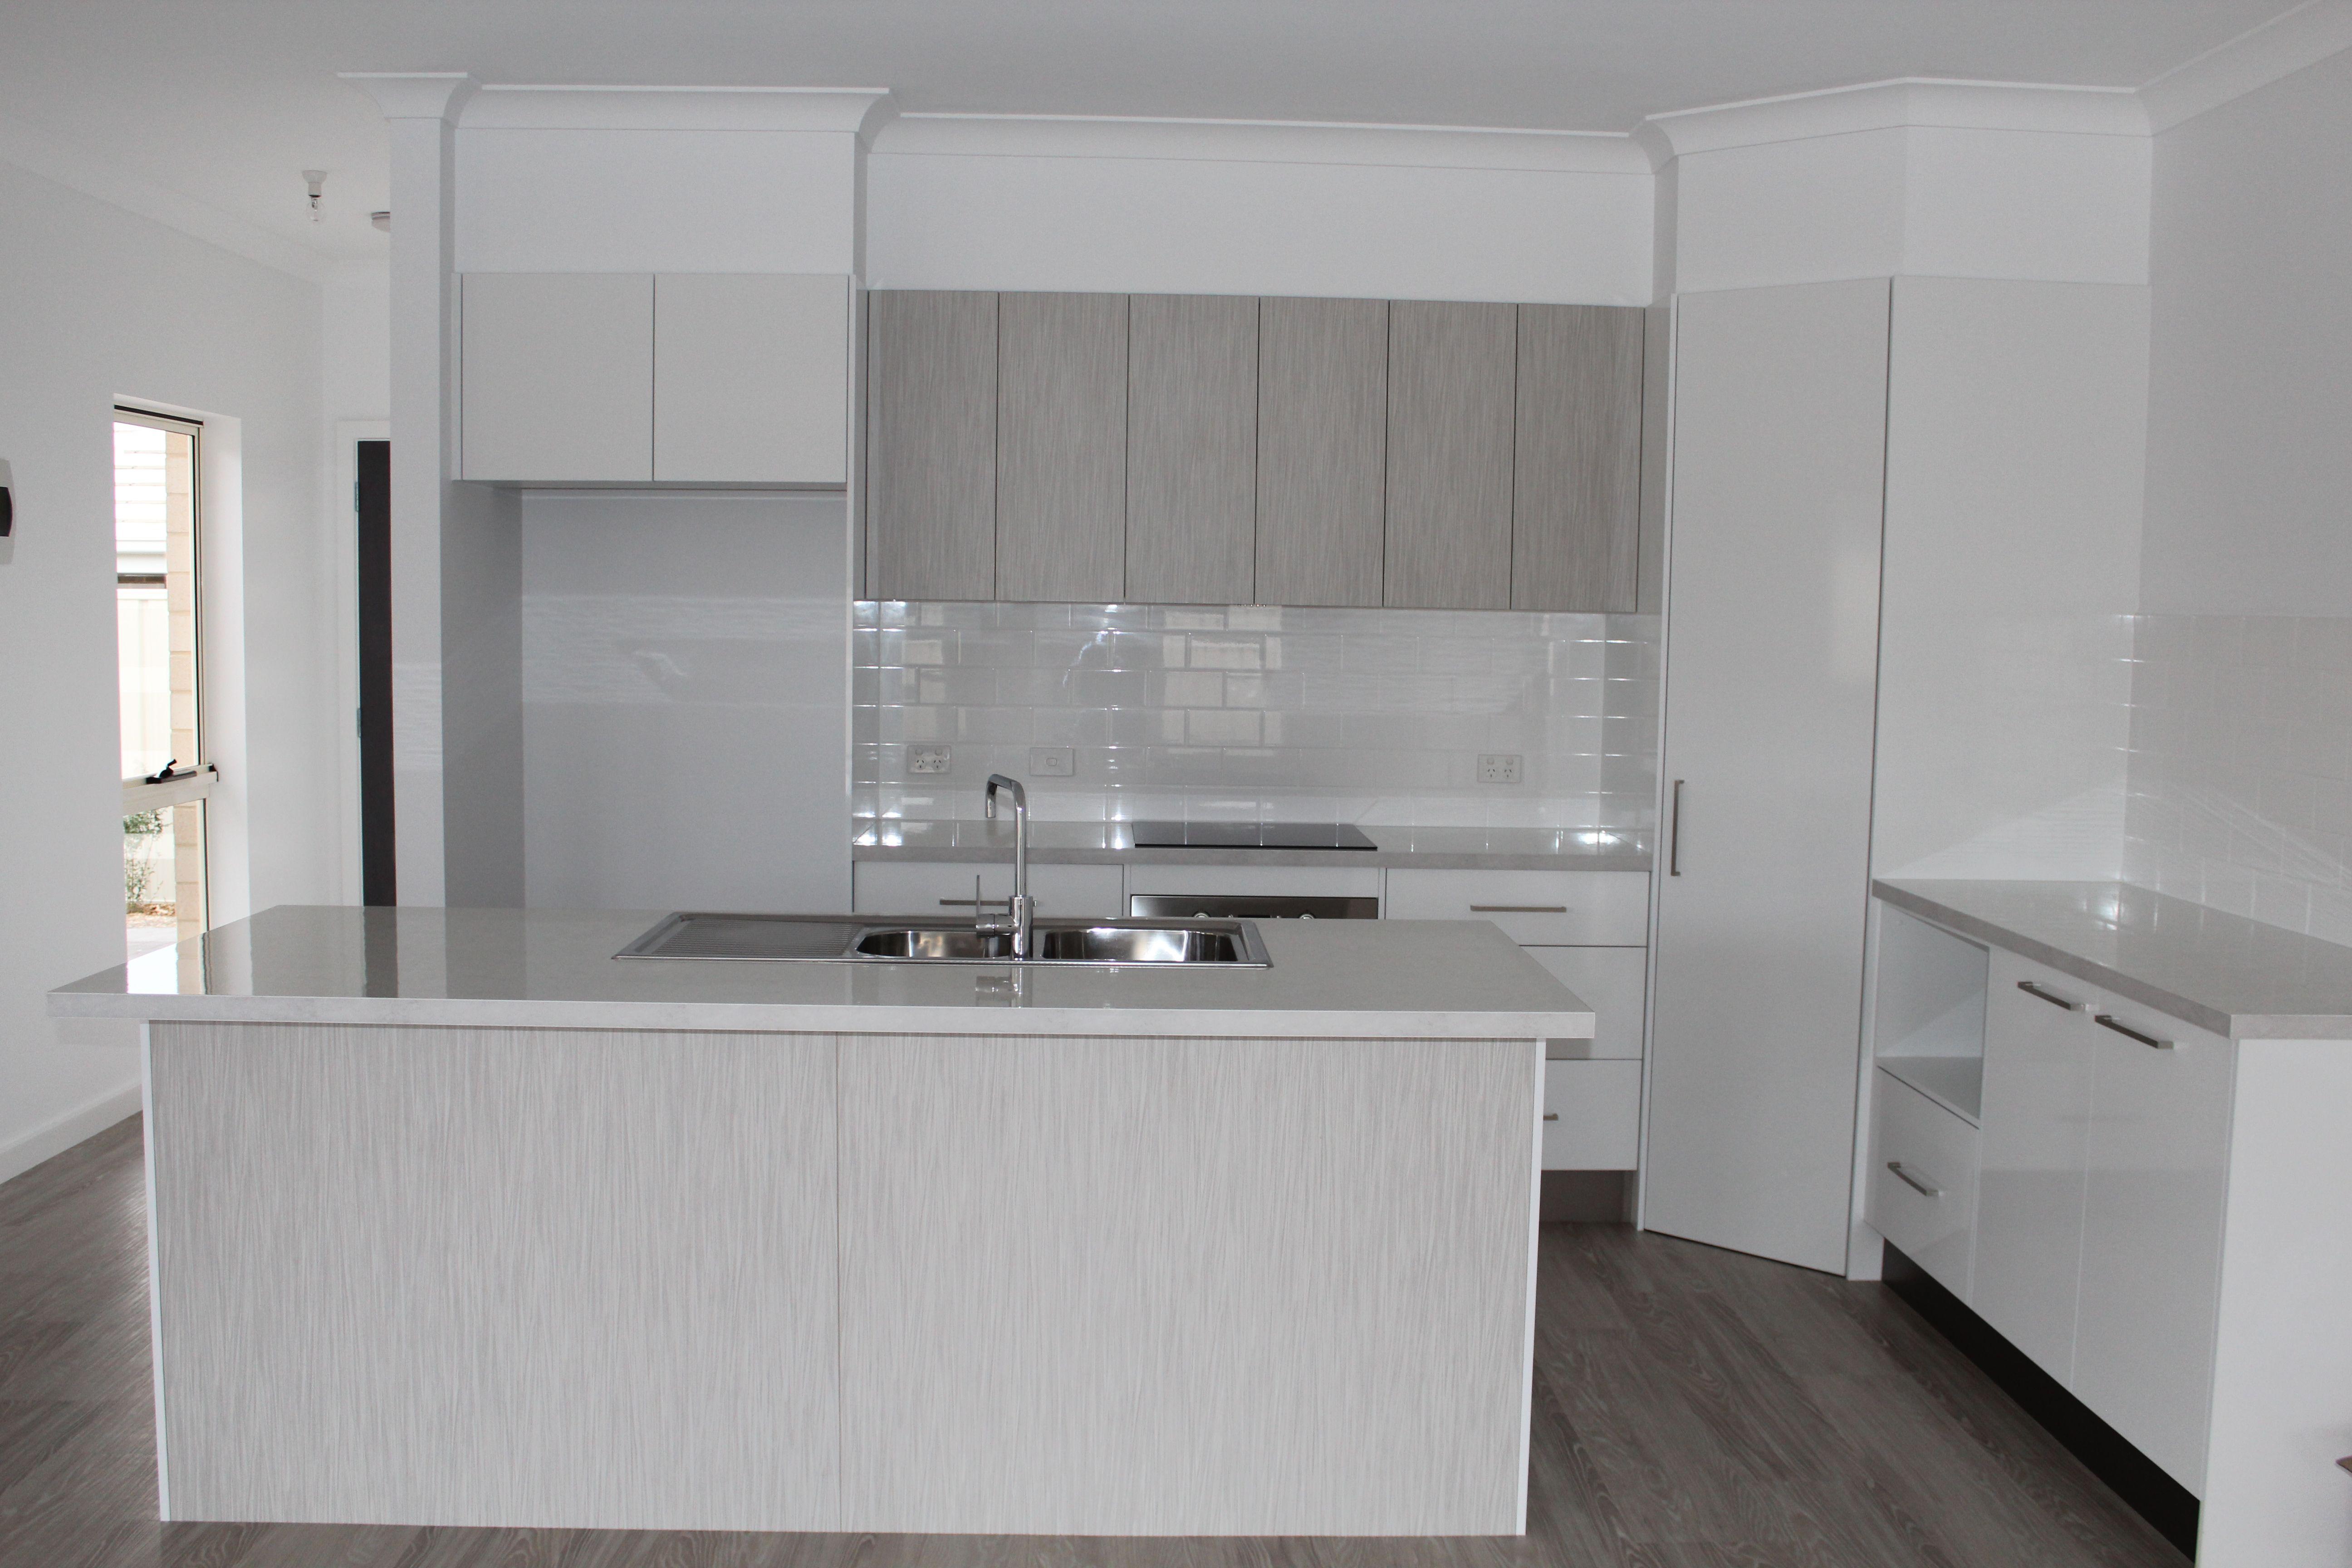 Benchtop - Laminex White Valencia Diamond Gloss Panels ...